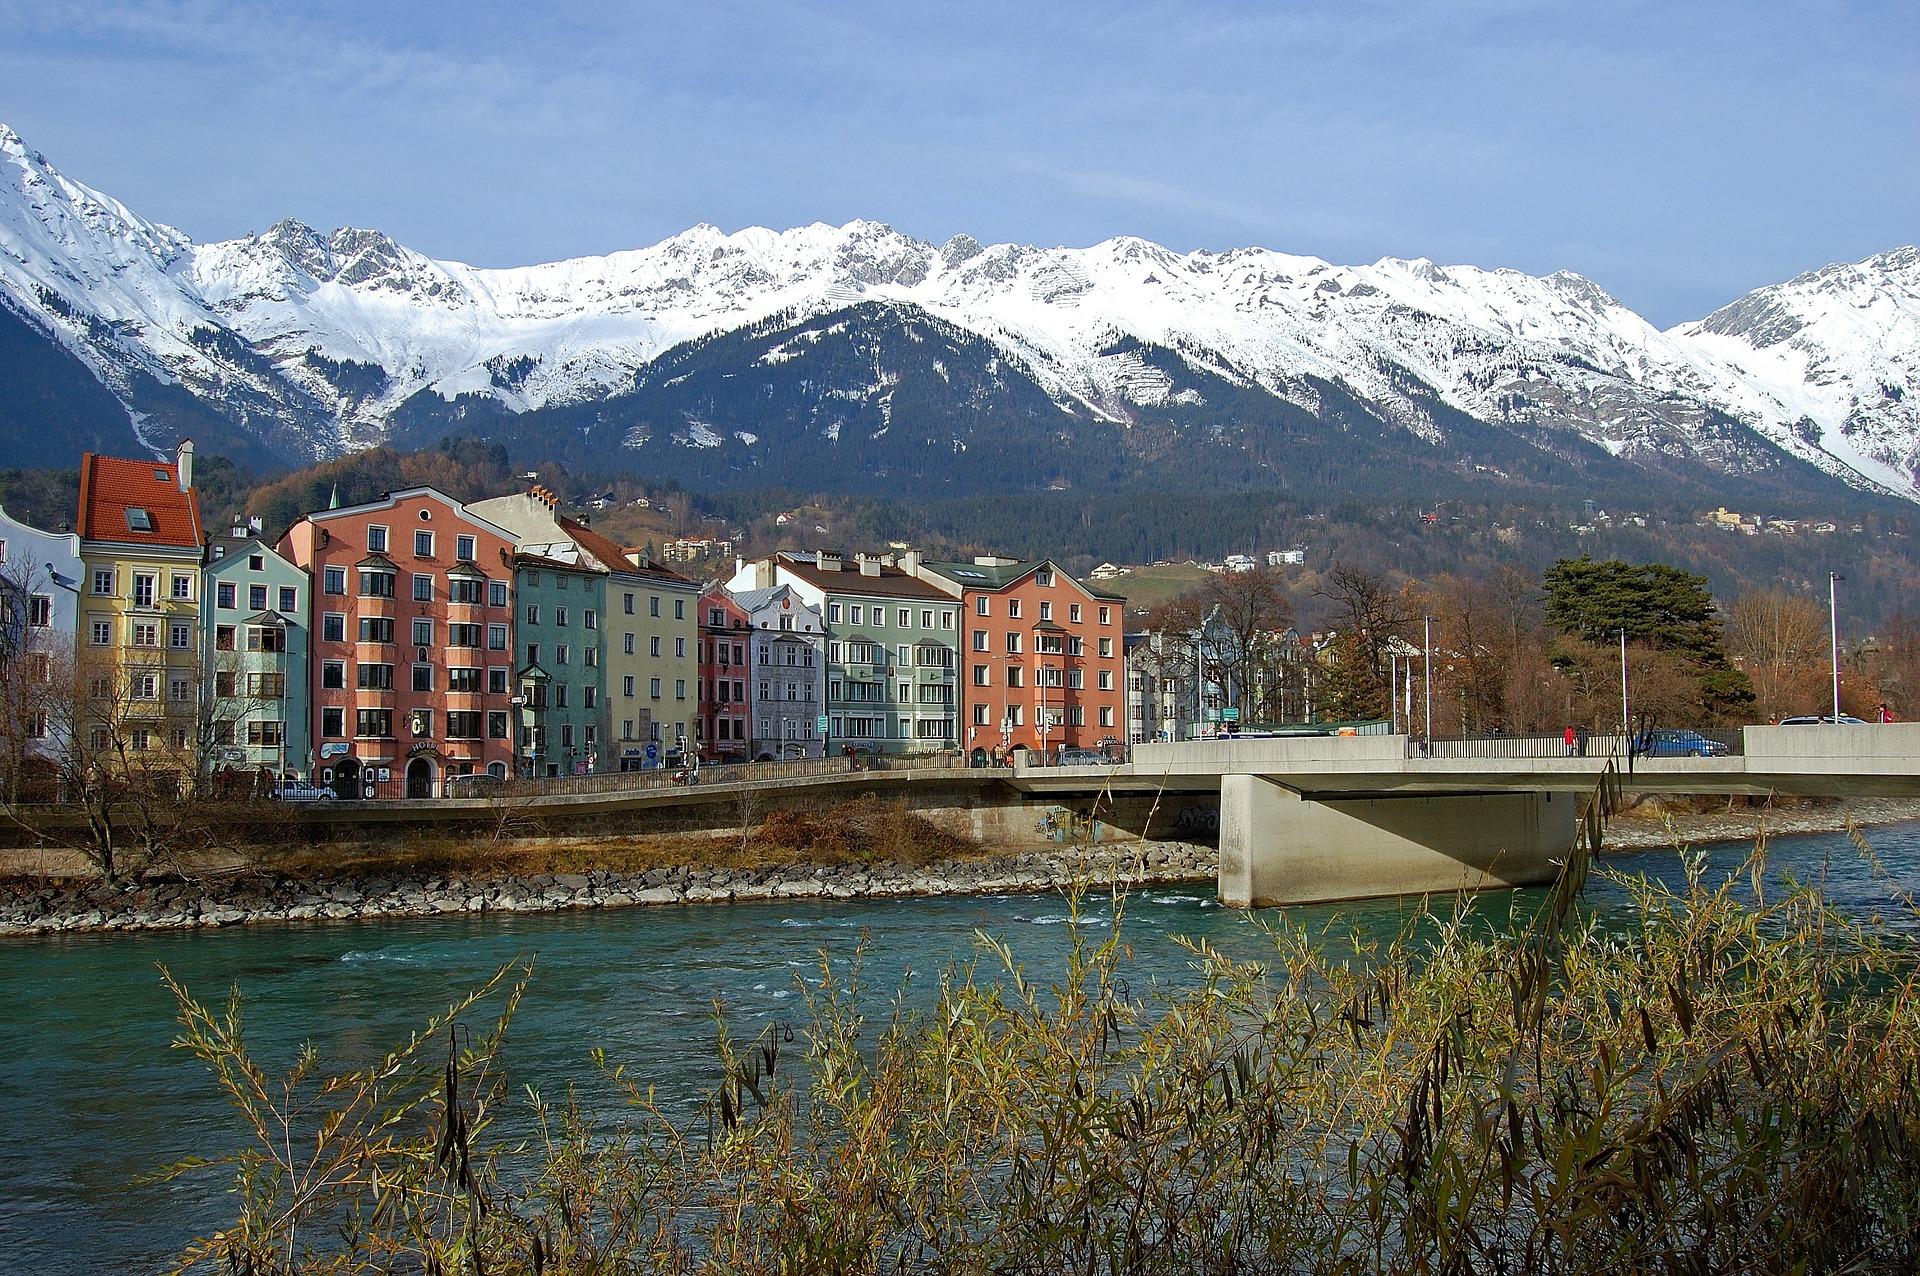 Dagje naar Innsbruck